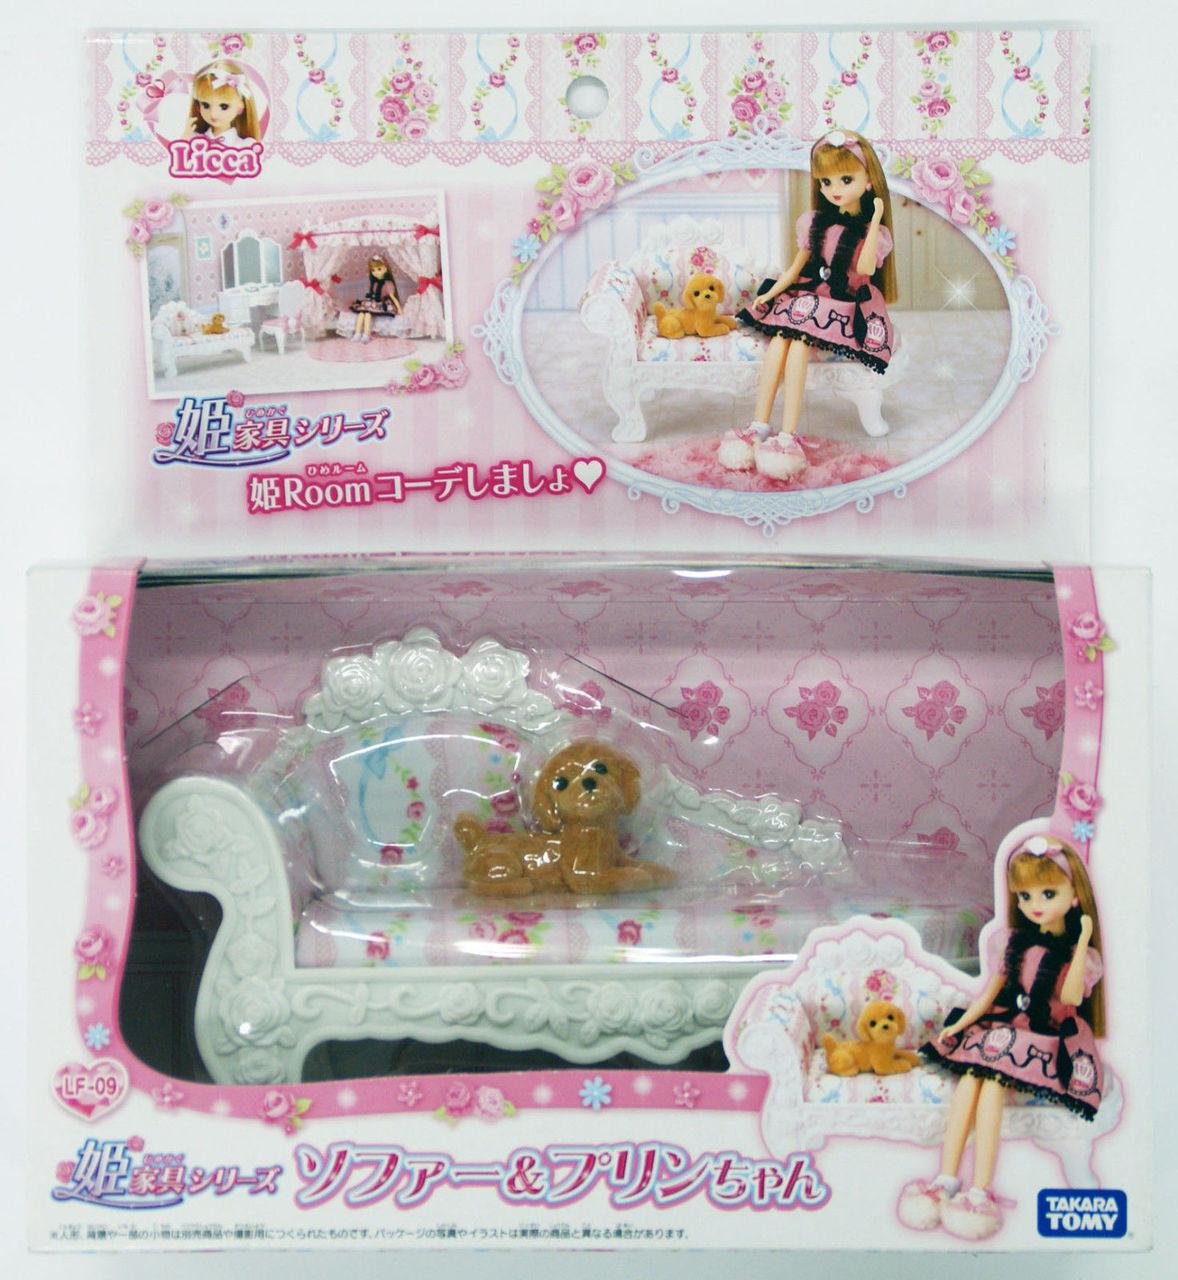 Takara Tomy Licca Doll Shoe Rack Japan Doll /& Shoe not included